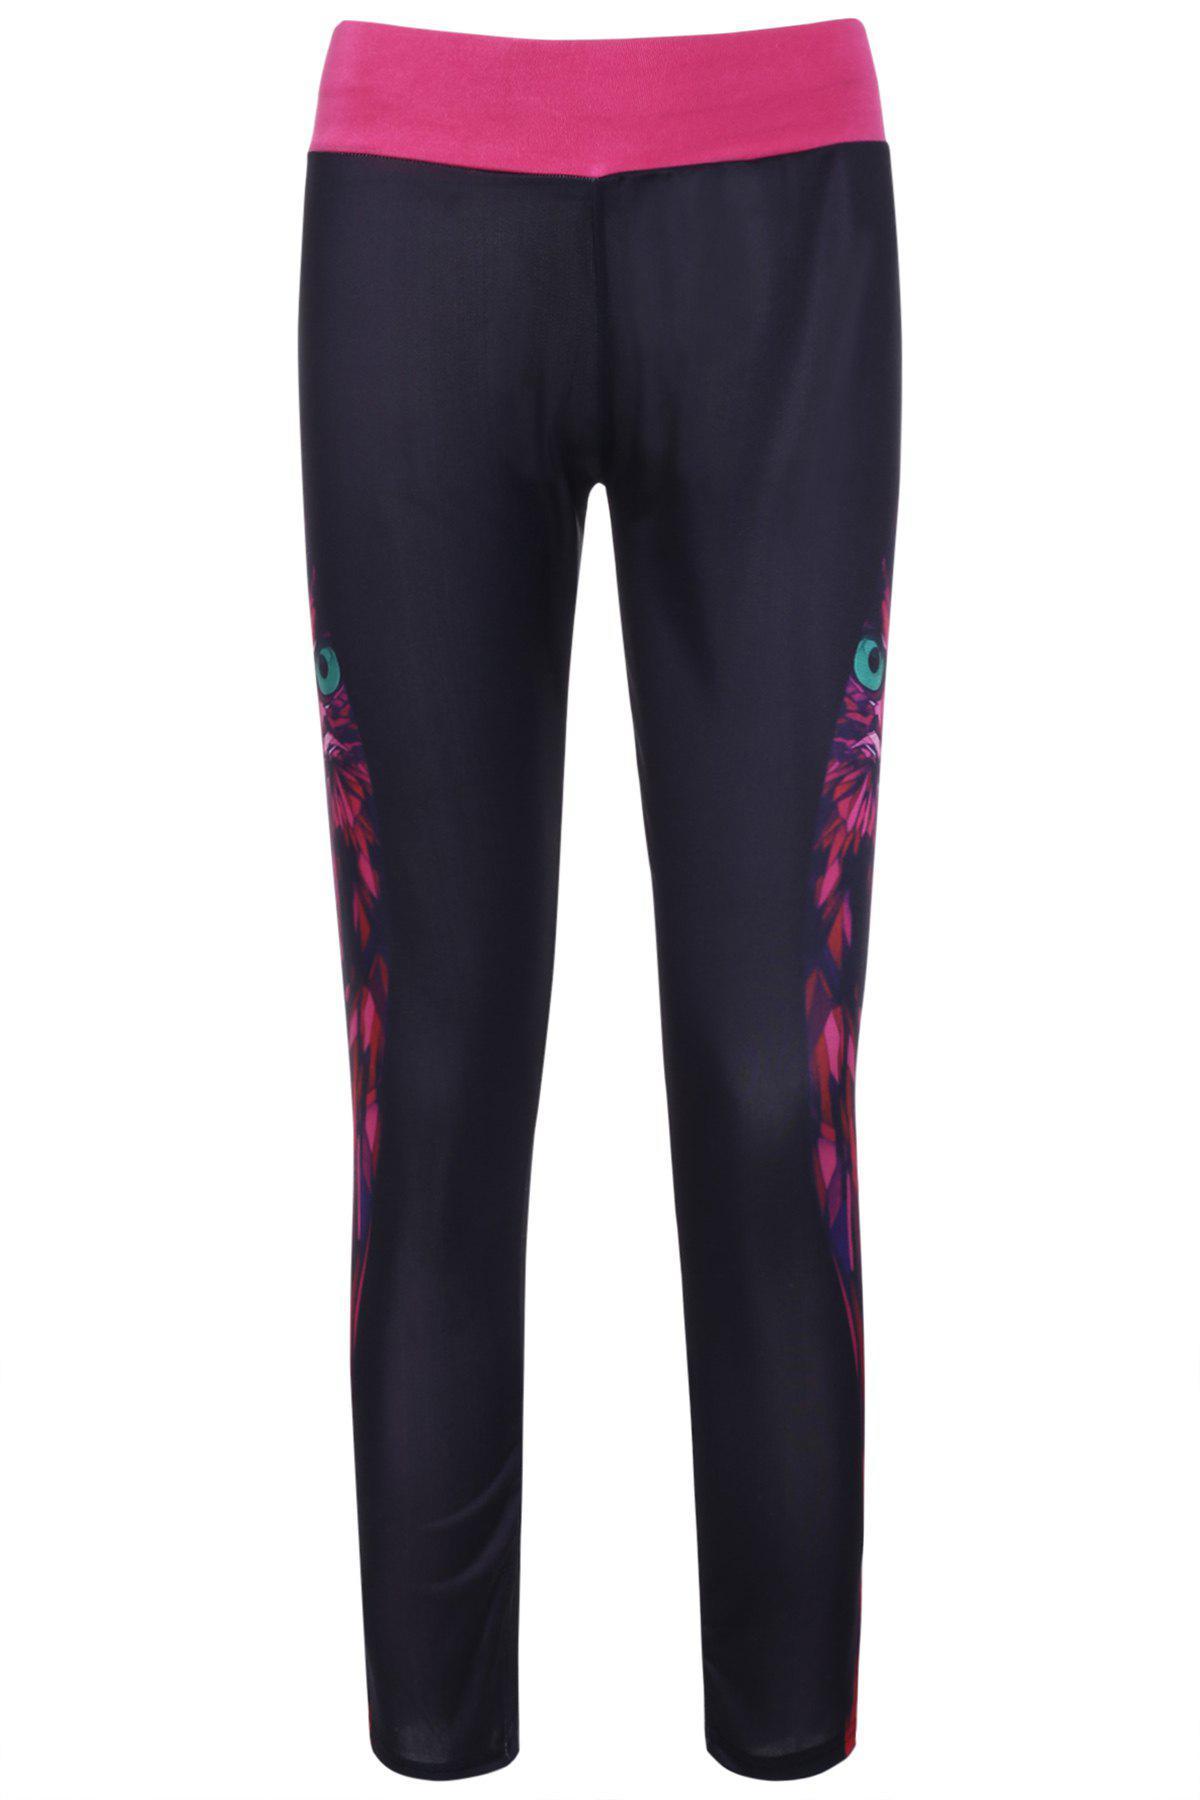 Owl Print Yoga Pants